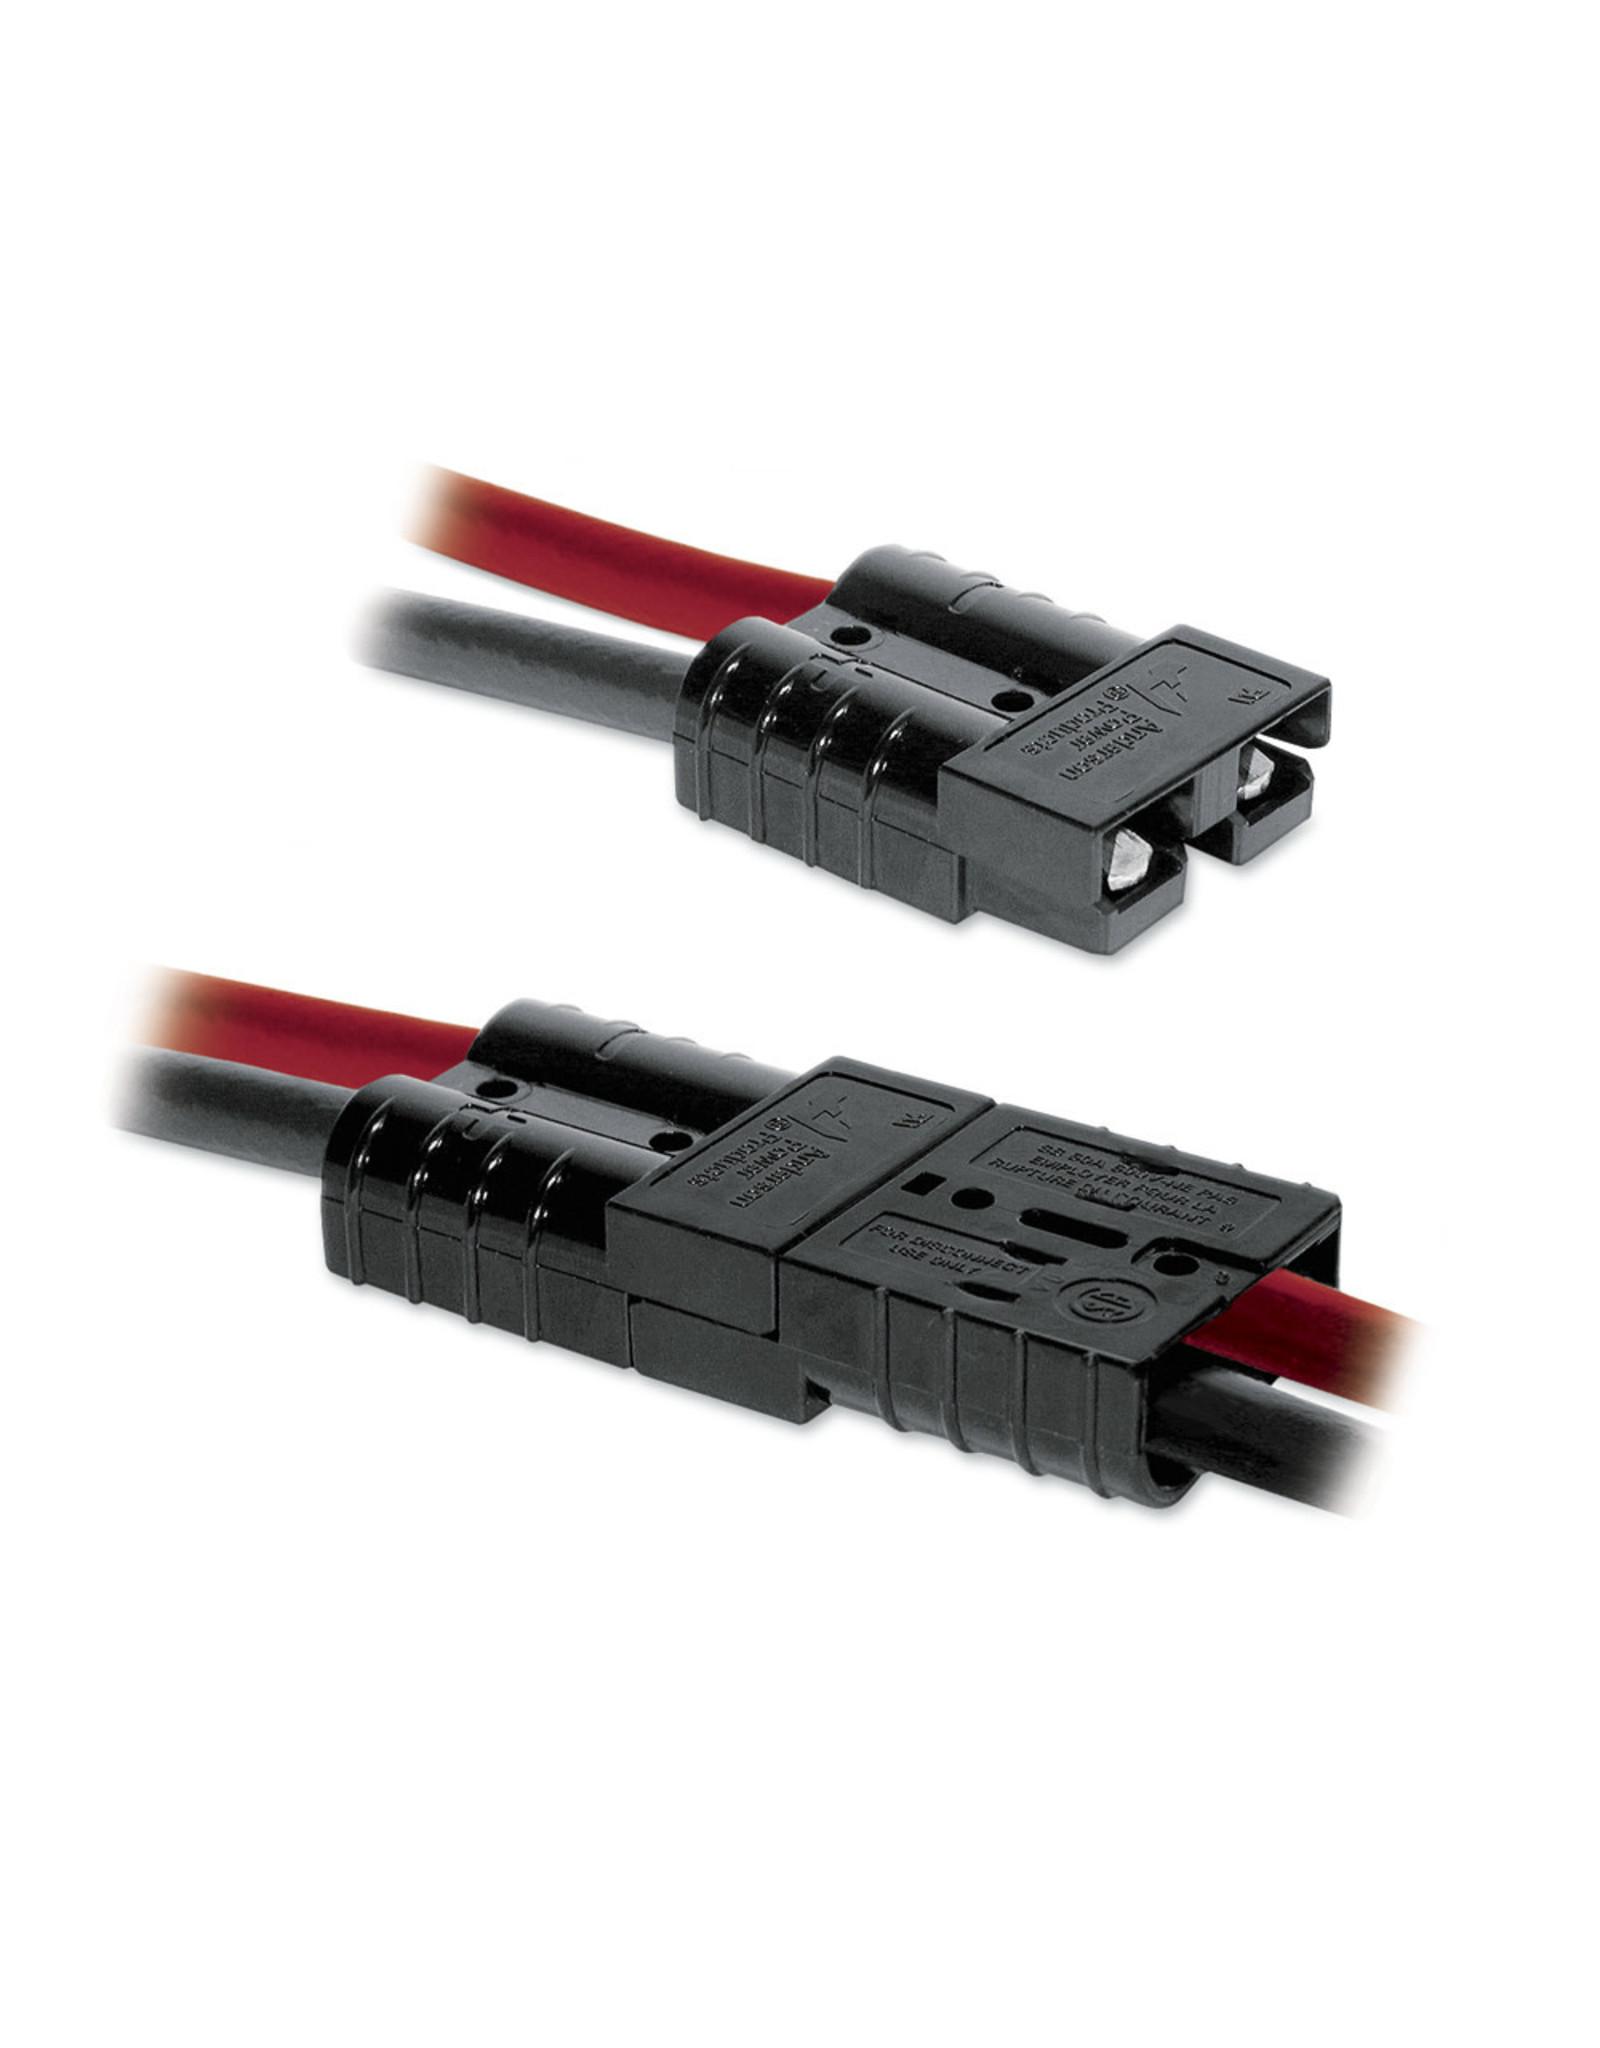 Minn Kota Trolling Motor Quick Connect Plug